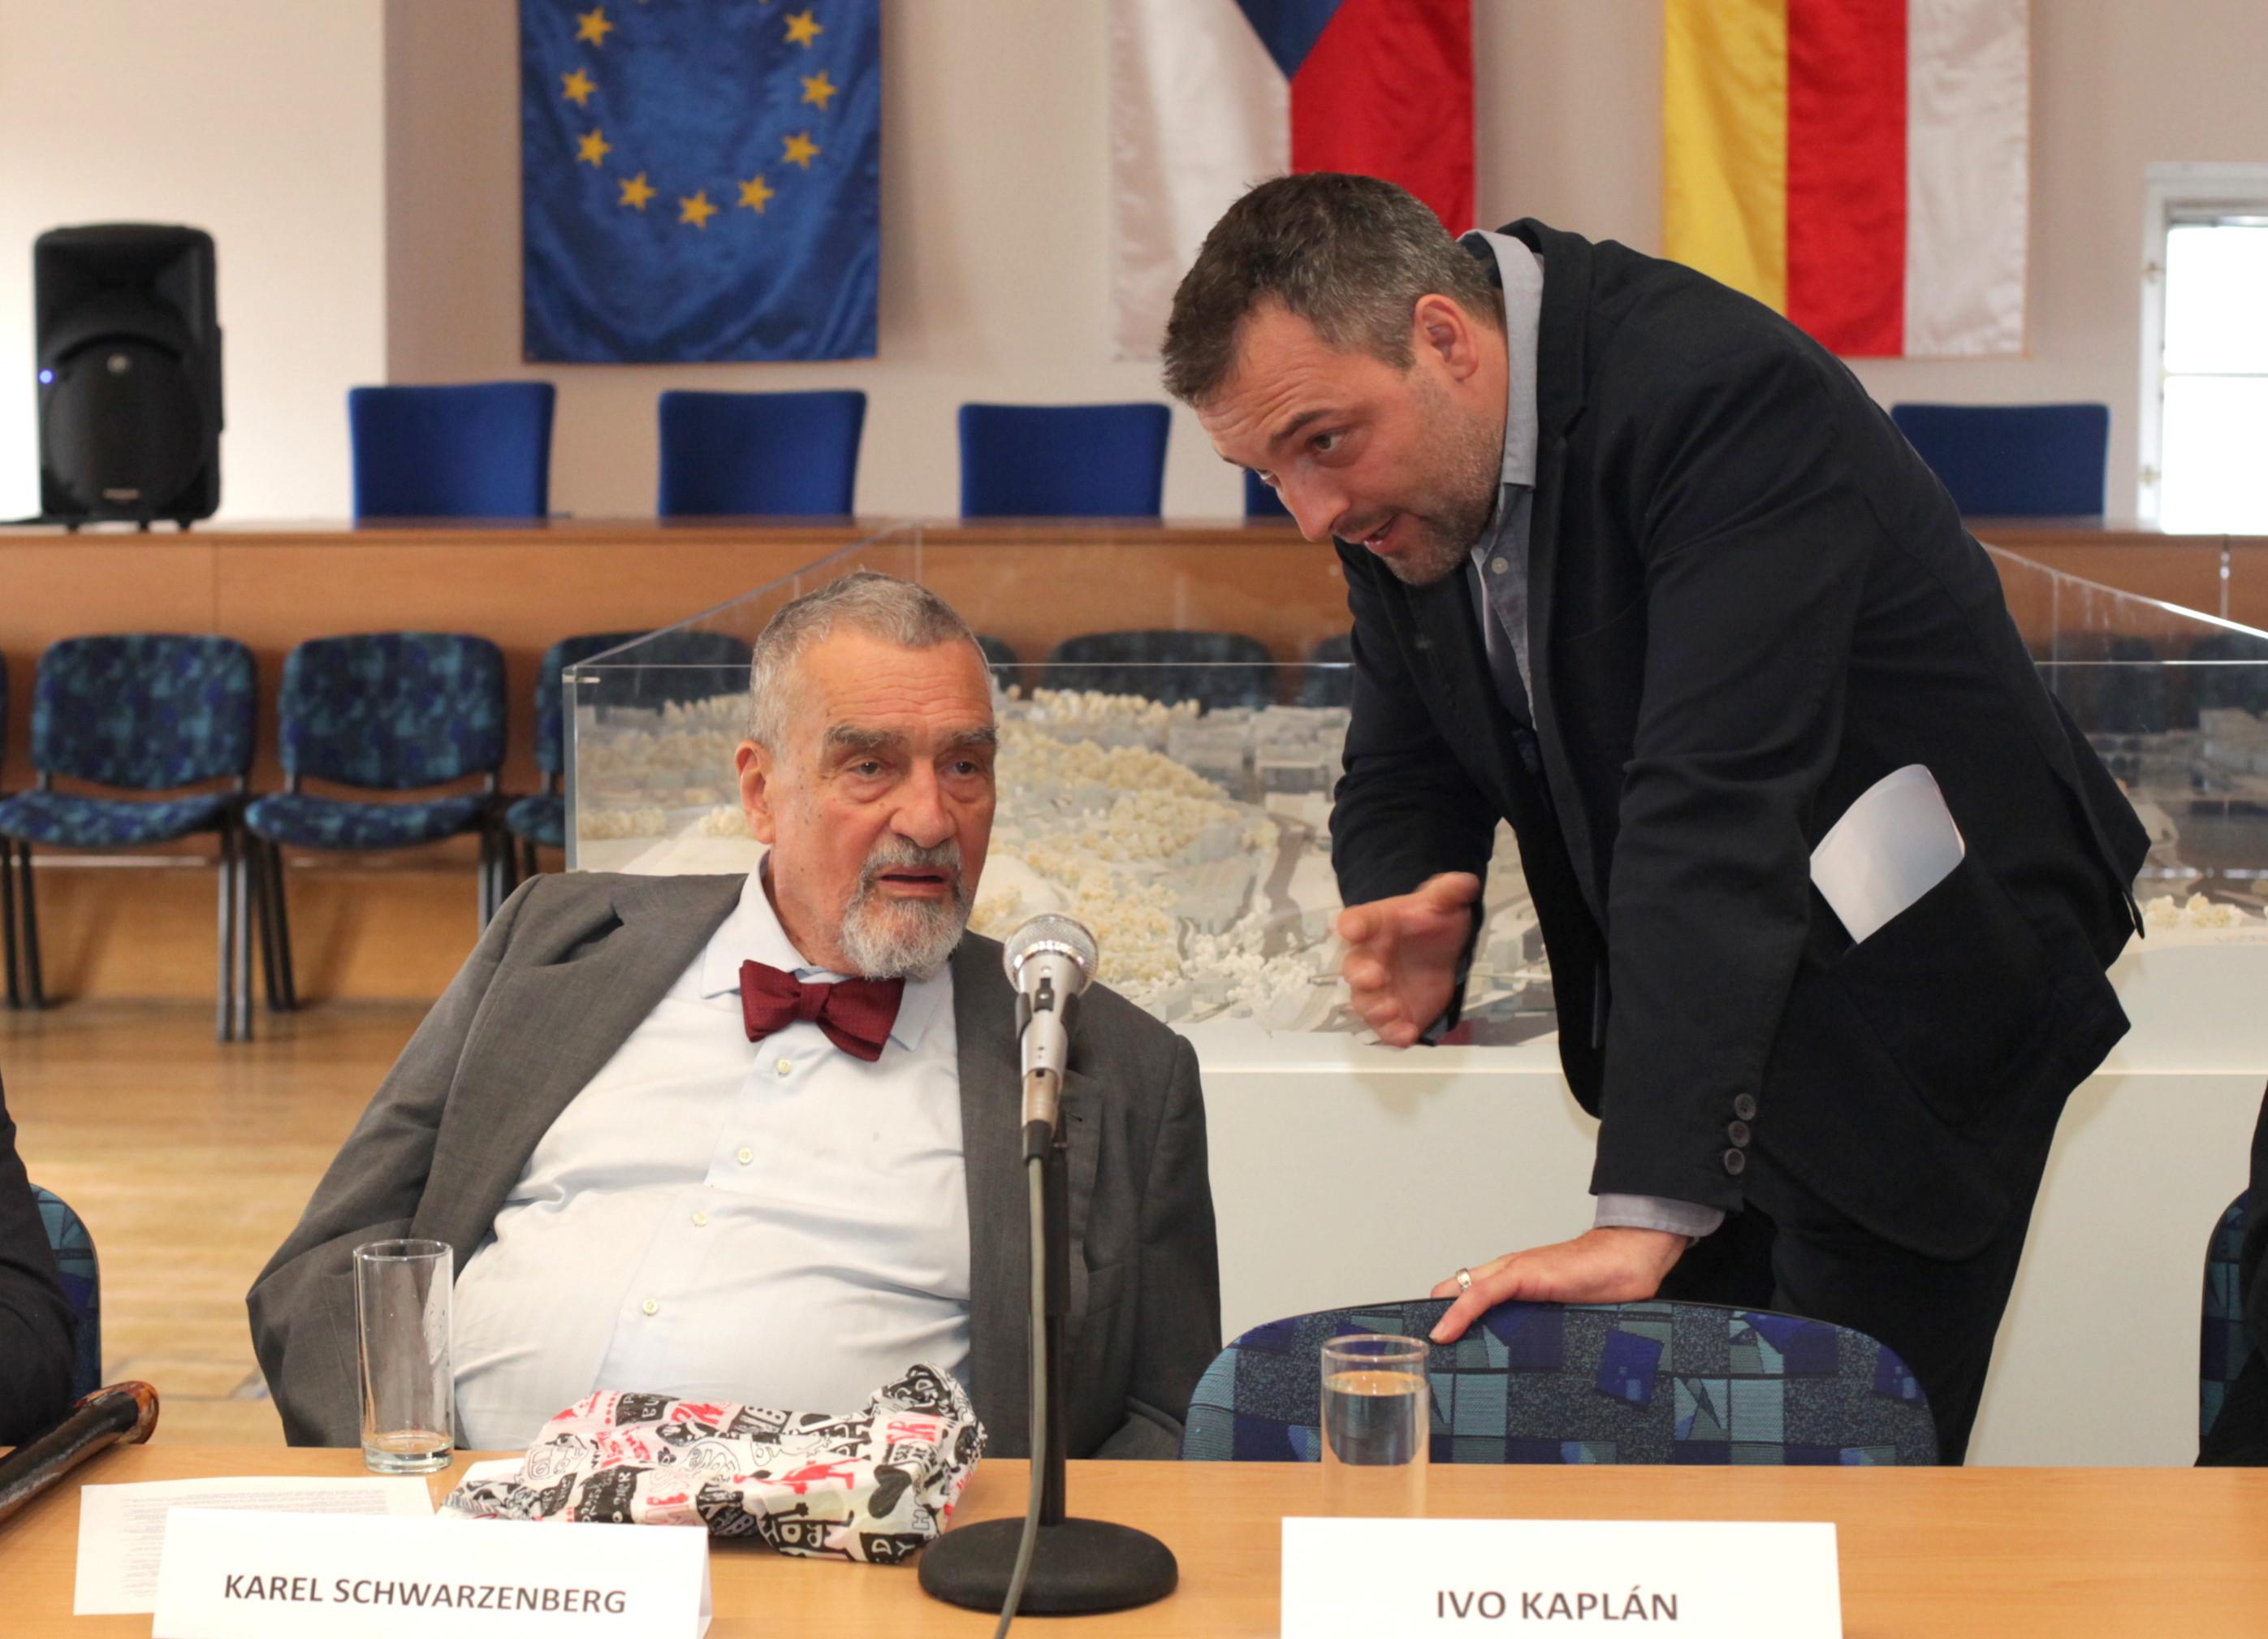 chceme-mezi-obcany-otvirat-krome-lokalnich-i-evropska-temata-rika-radni-prahy-5-rattay